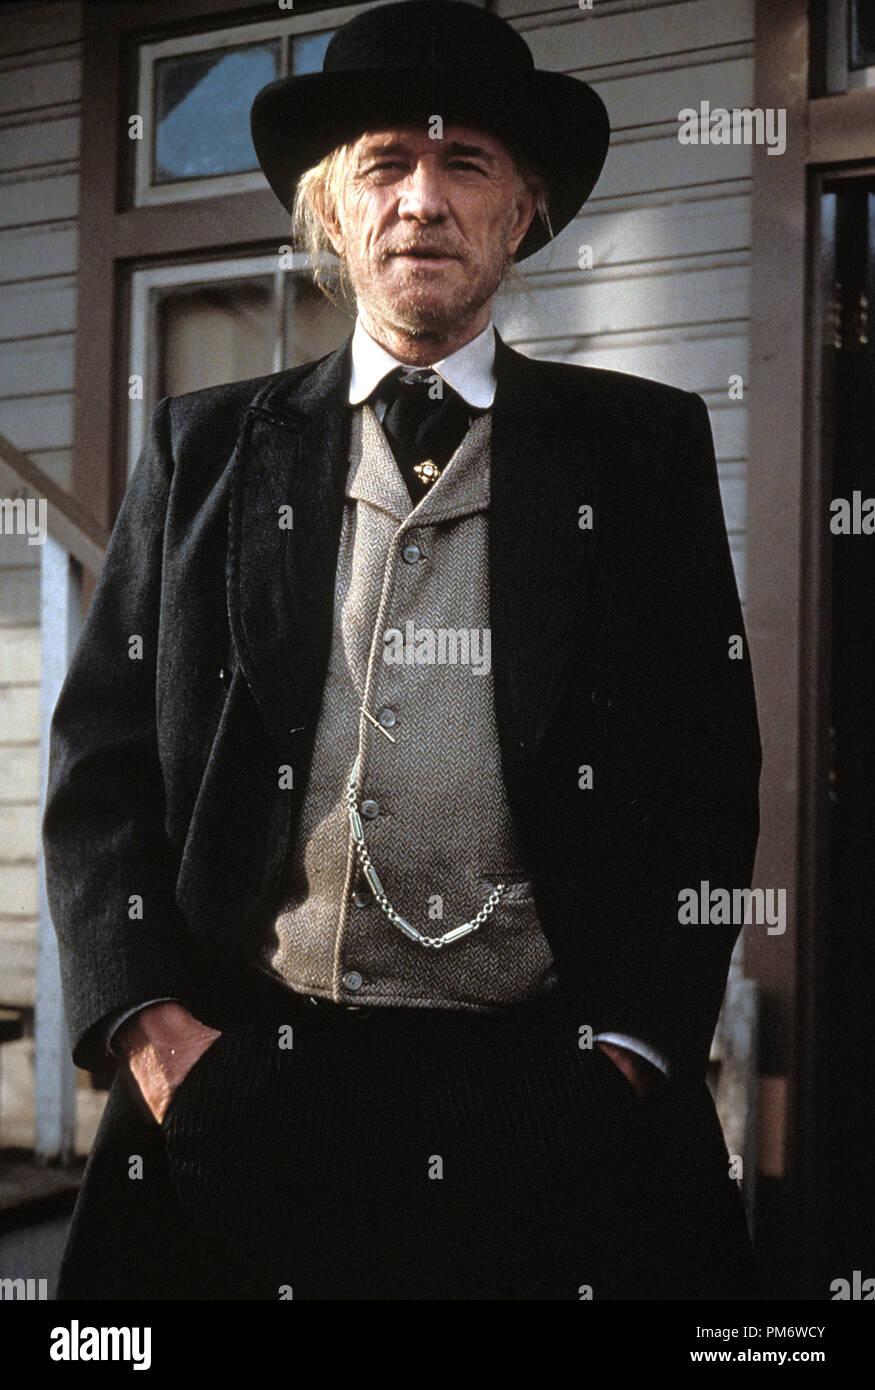 Film Still from 'Unforgiven' Richard Harris © 1992 Warner Brothers - Stock Image